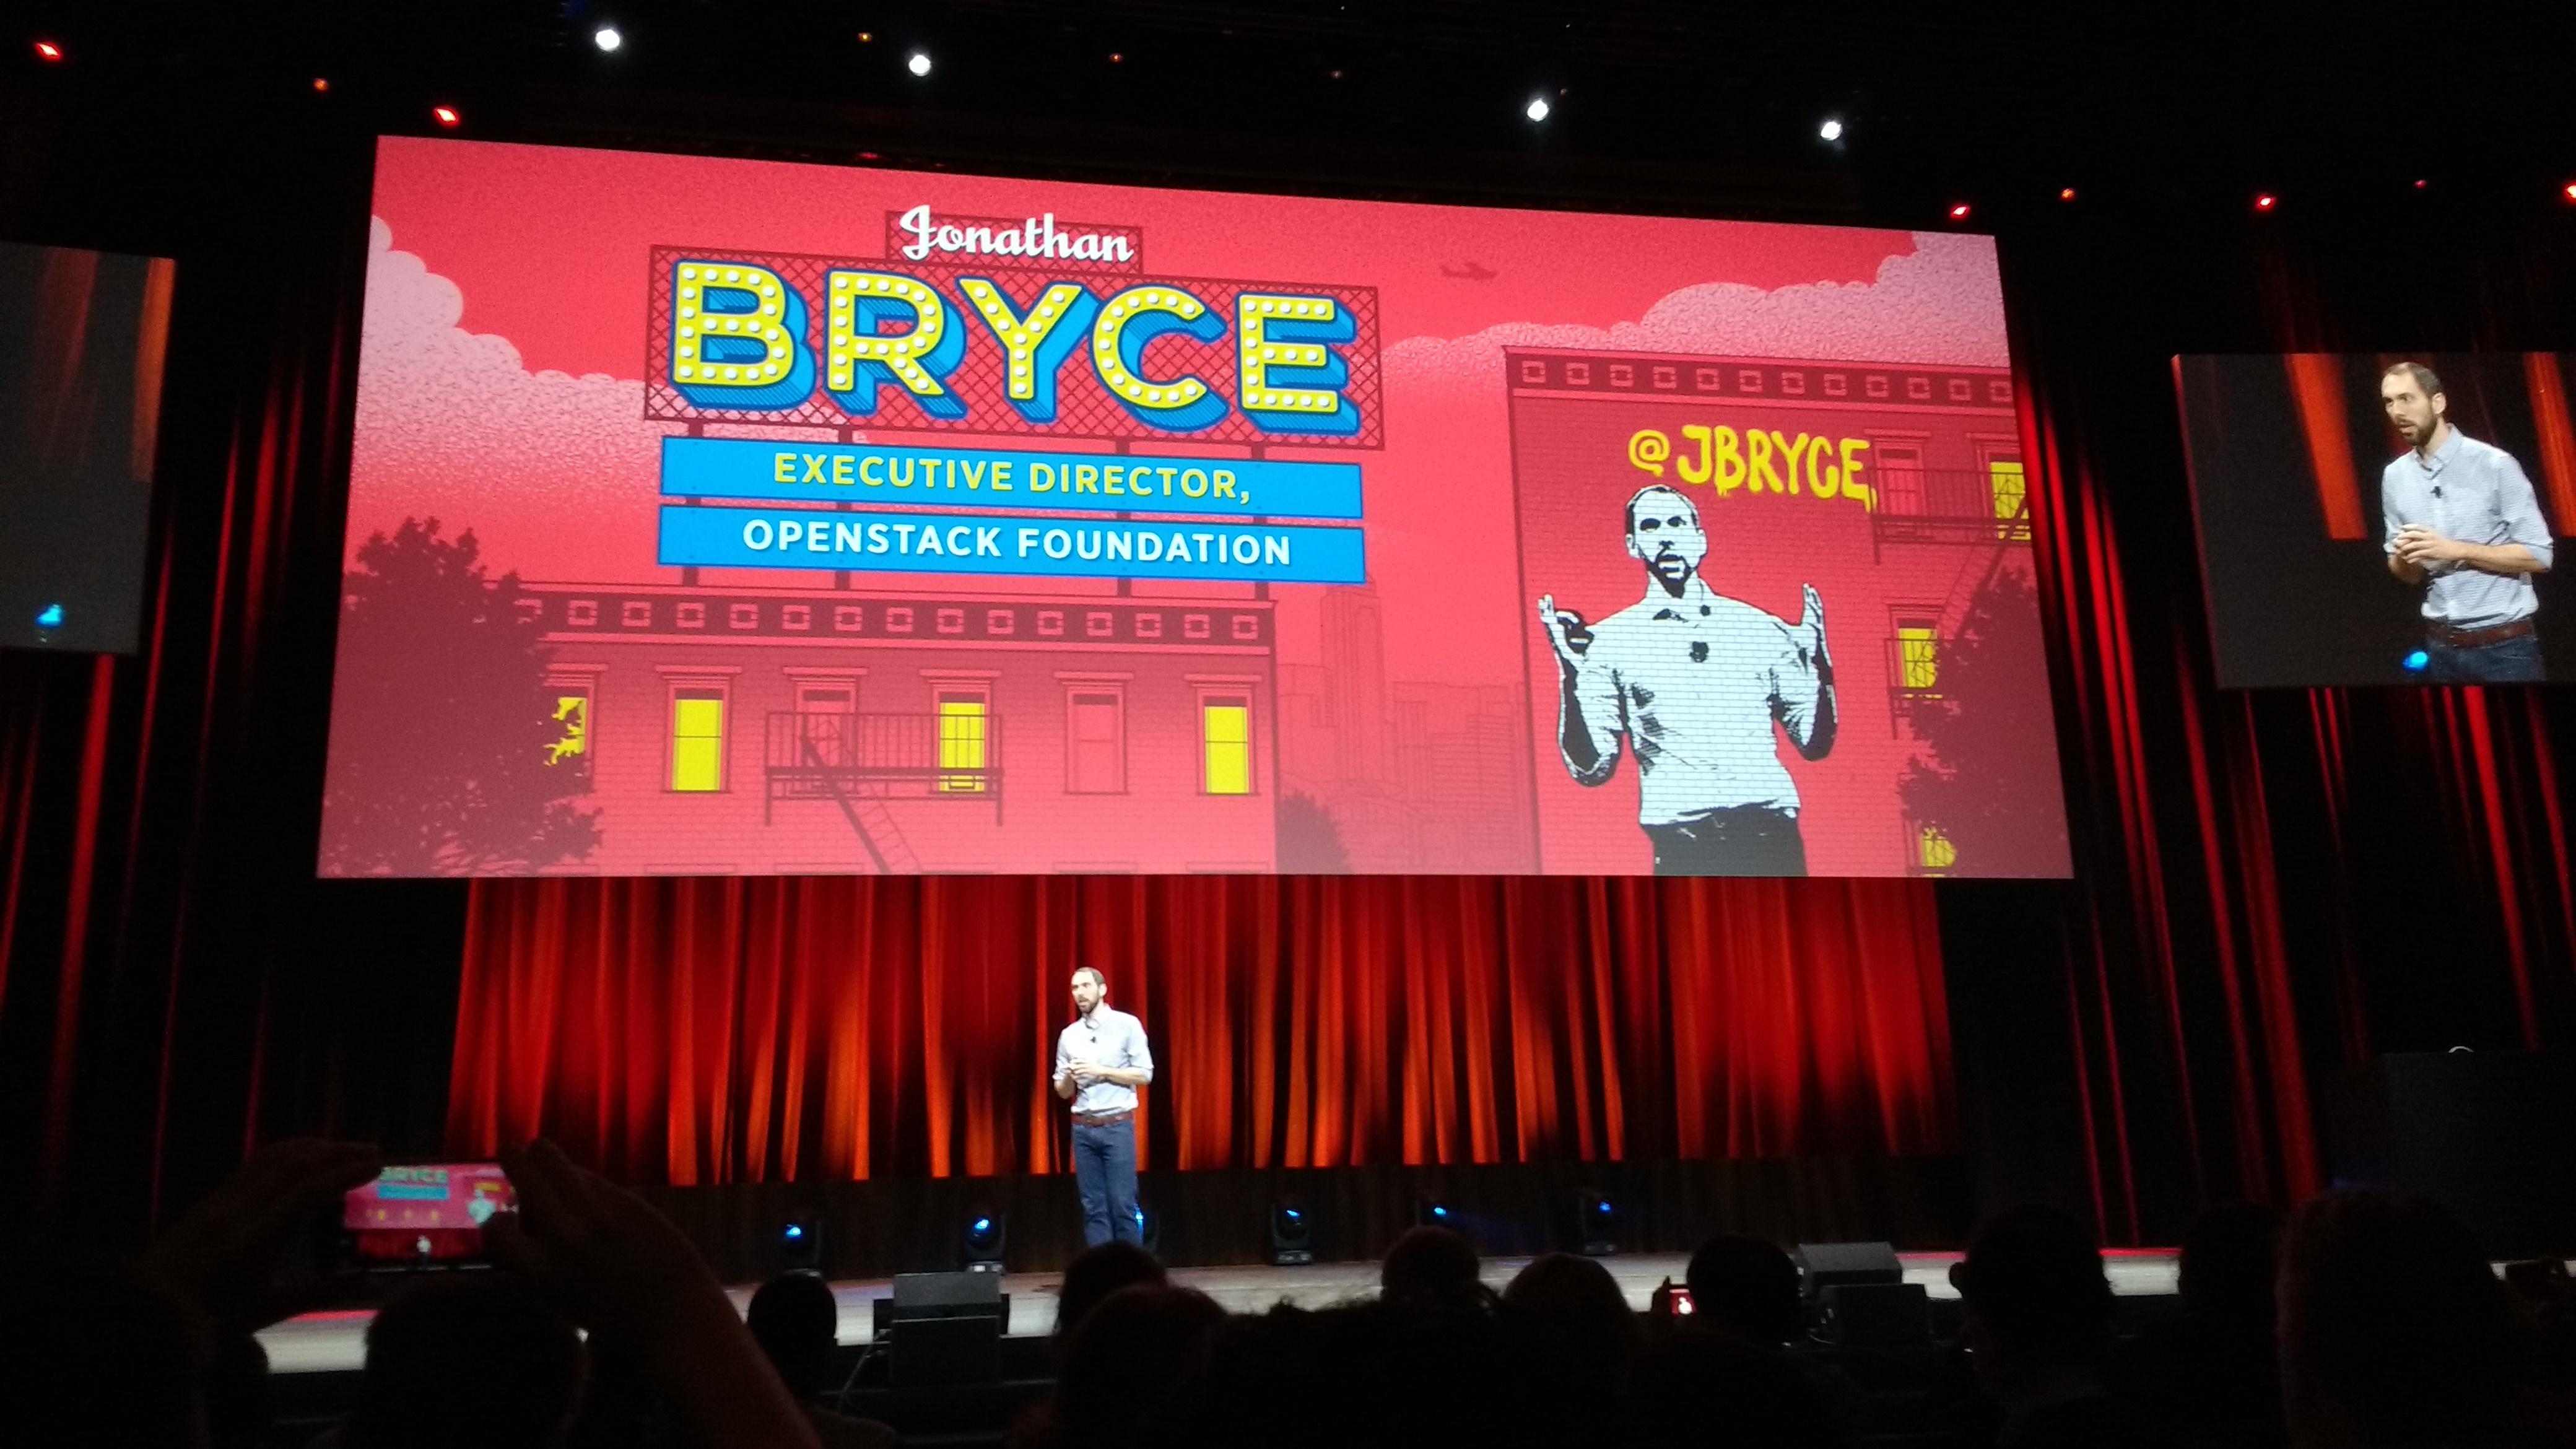 Jonathan Bryce